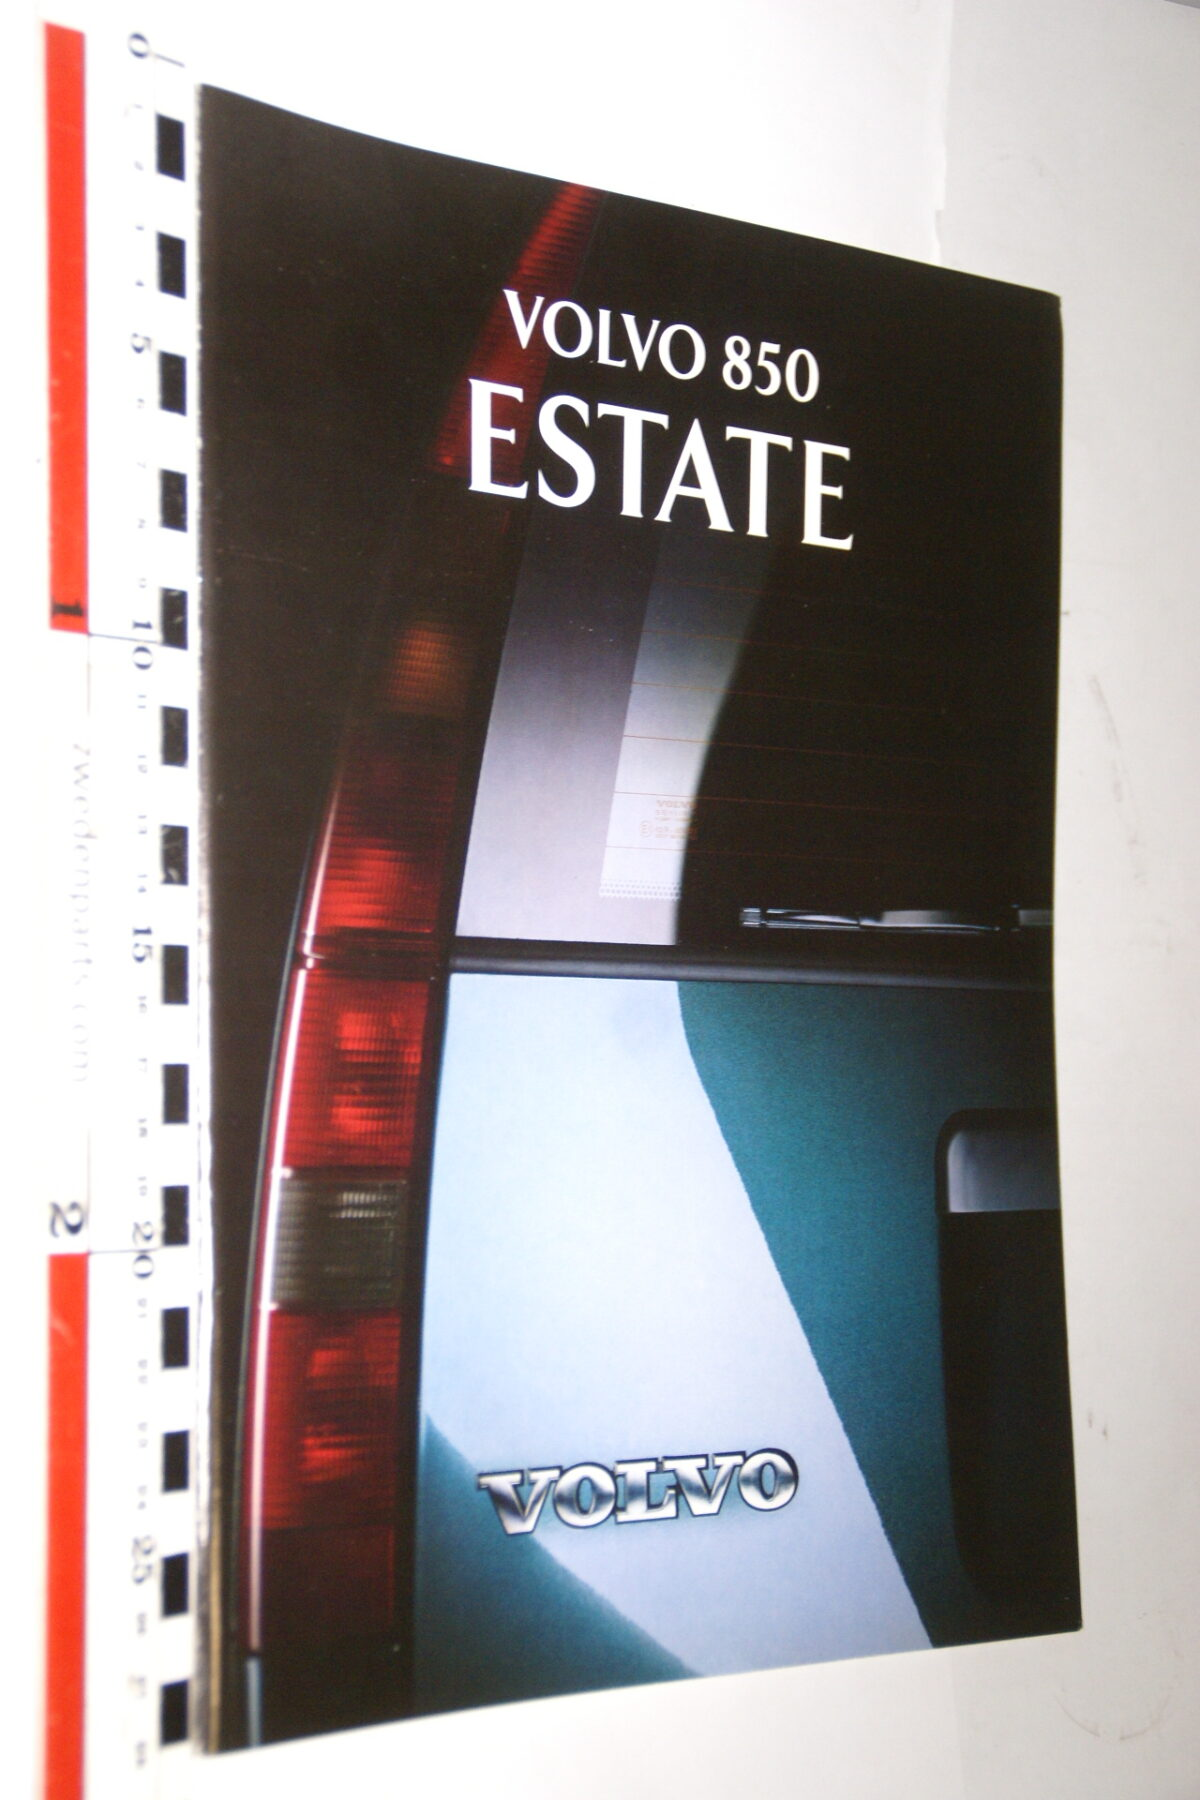 DSC05282 1993 originele brochure Volvo 850 Estate nr MSPV 5764-df5bccf7